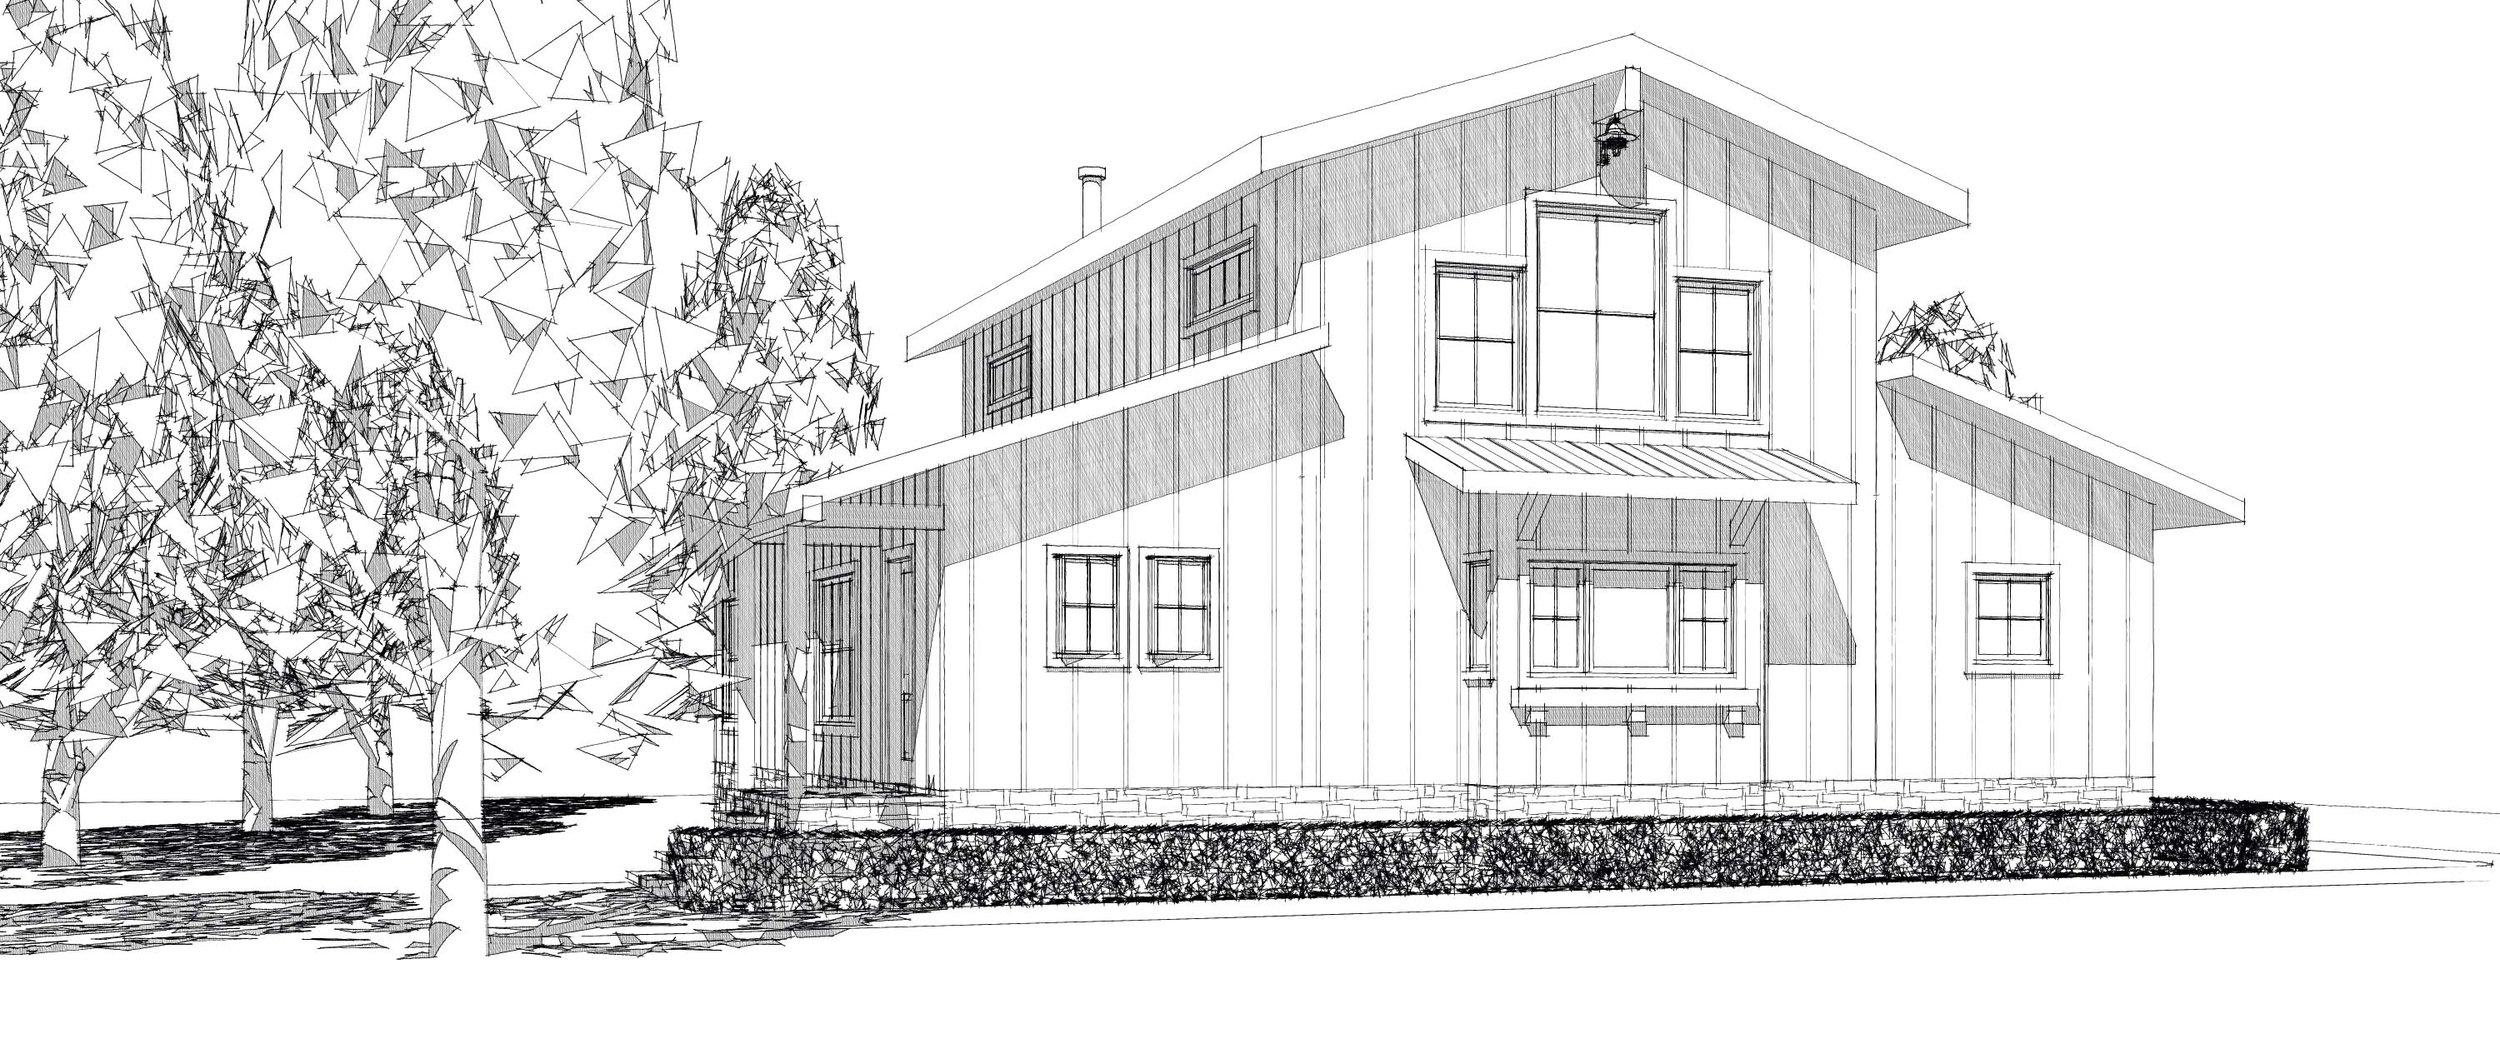 Wright Cabin 6-28-14a.jpg